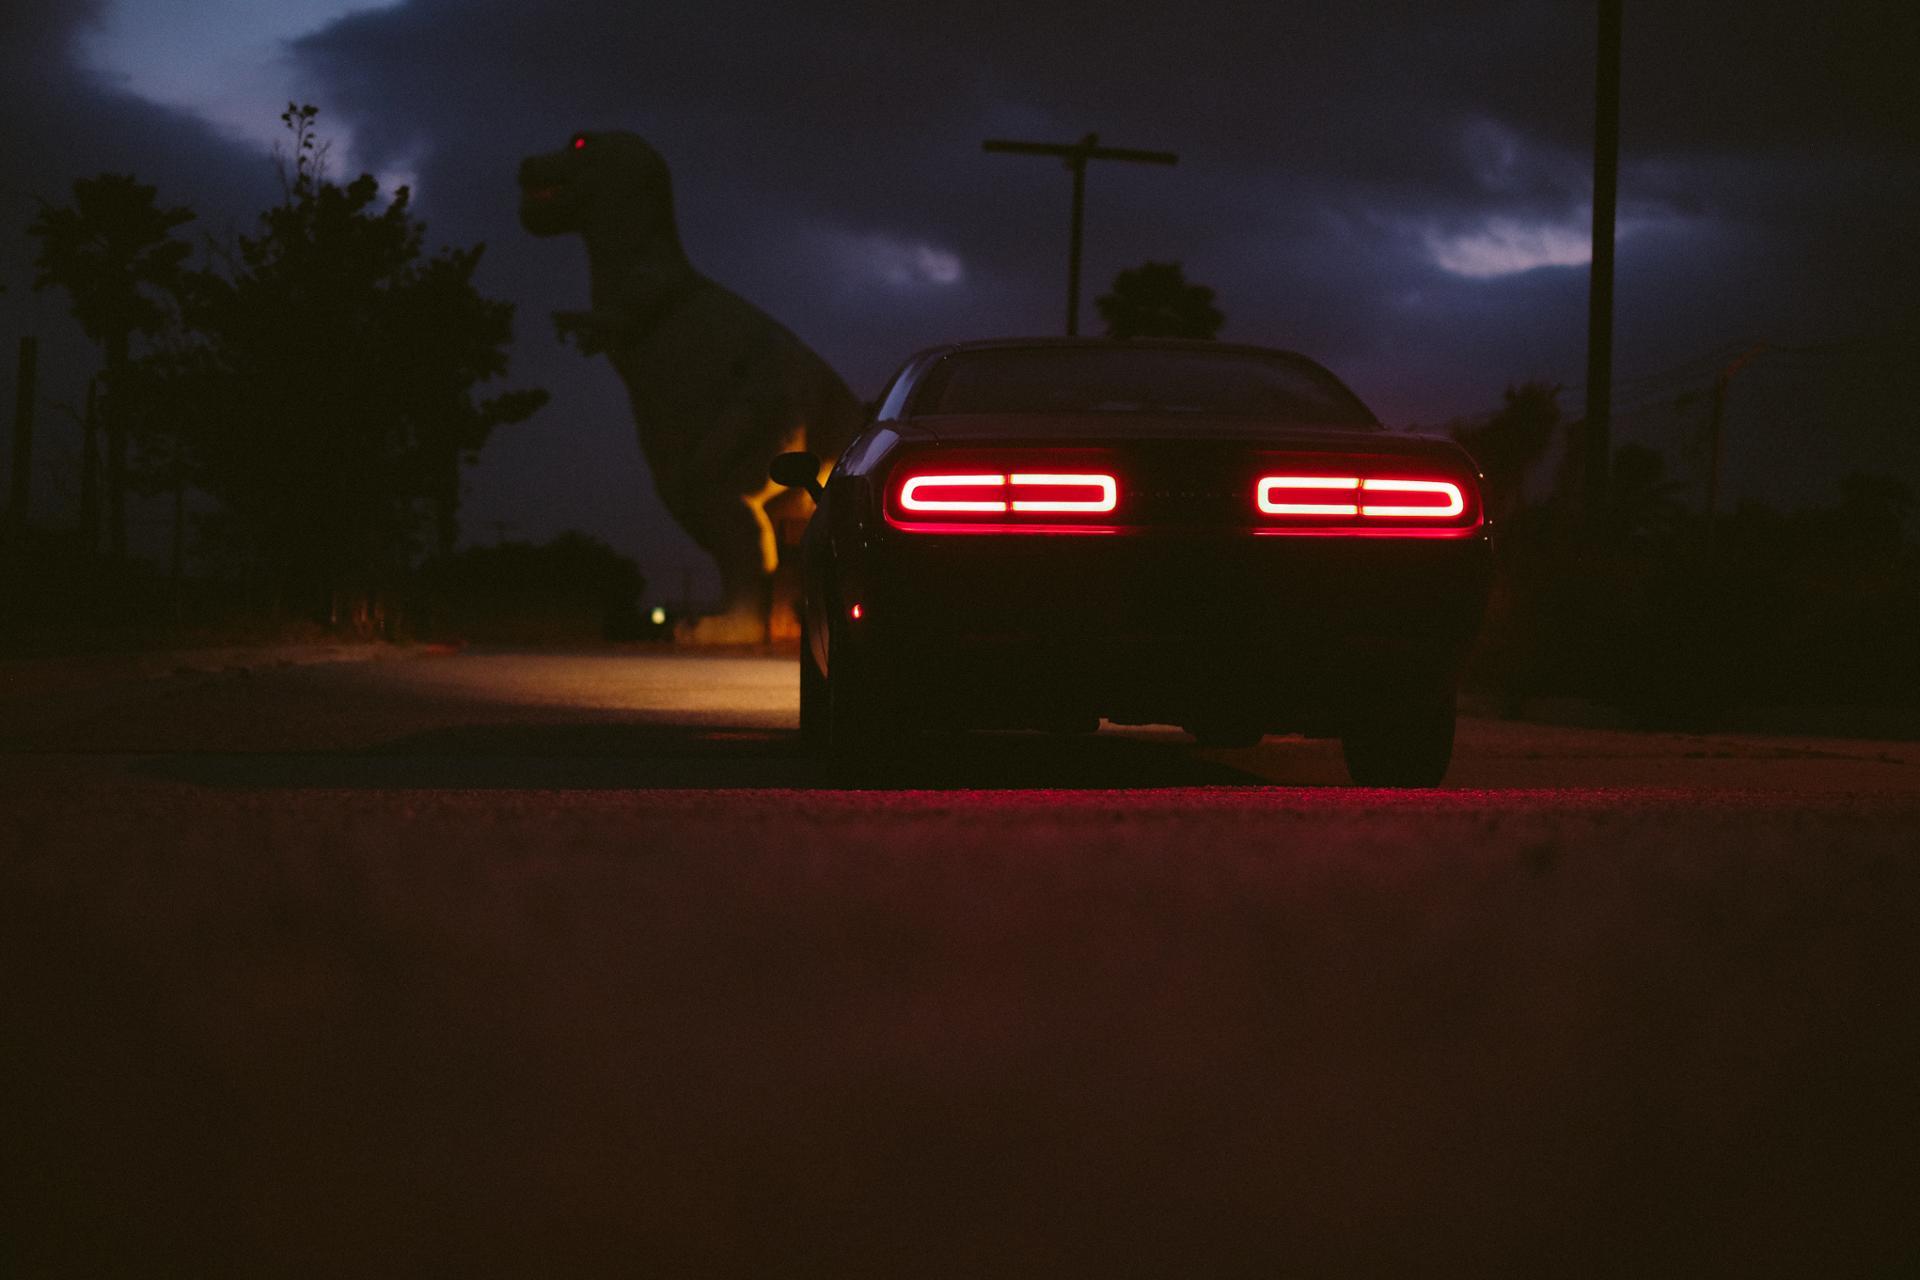 T-Rex & the Dodge